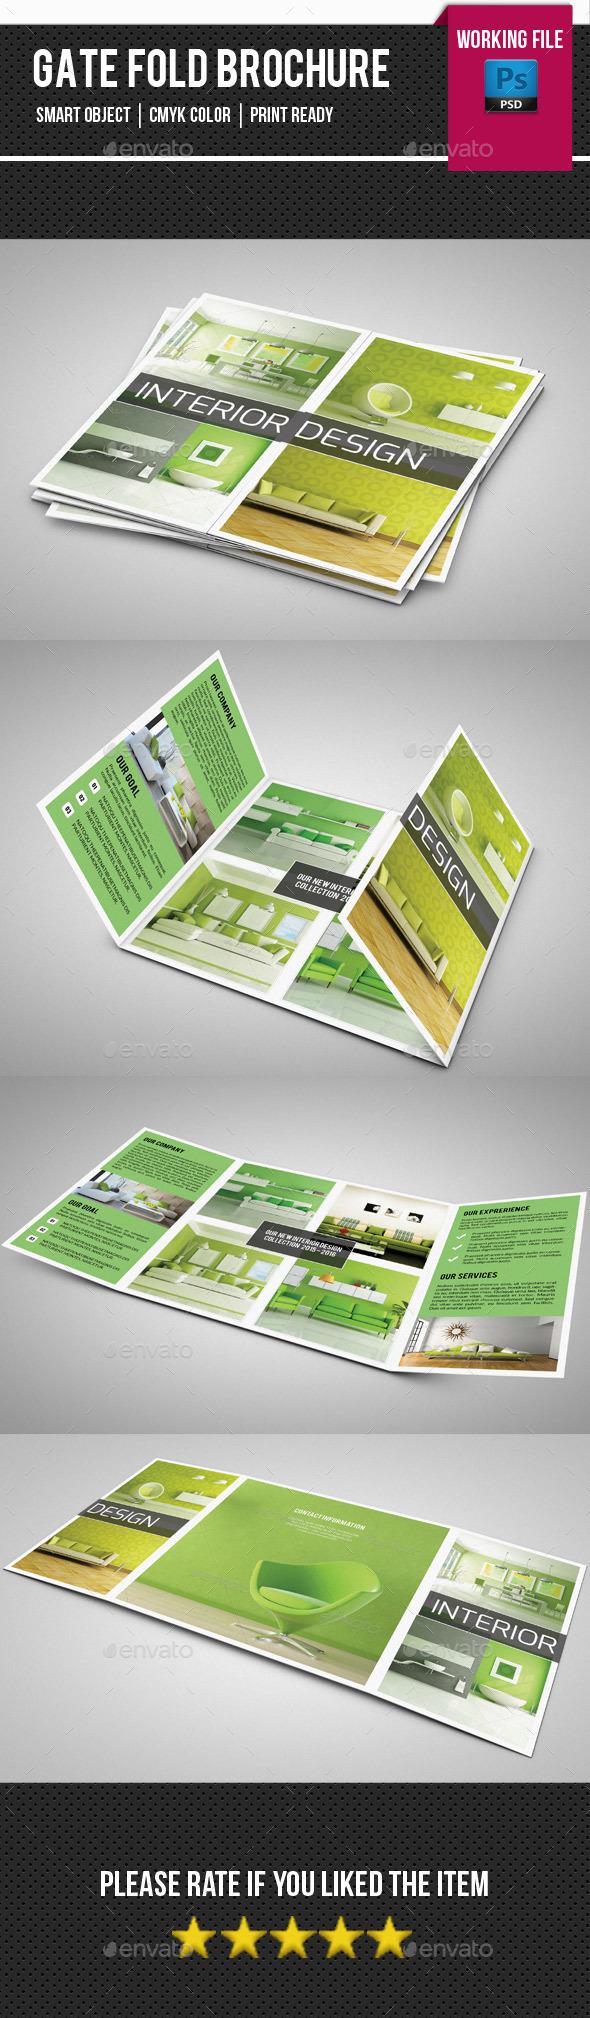 Square Gate Fold Interior Brochure-V02 - Corporate Brochures